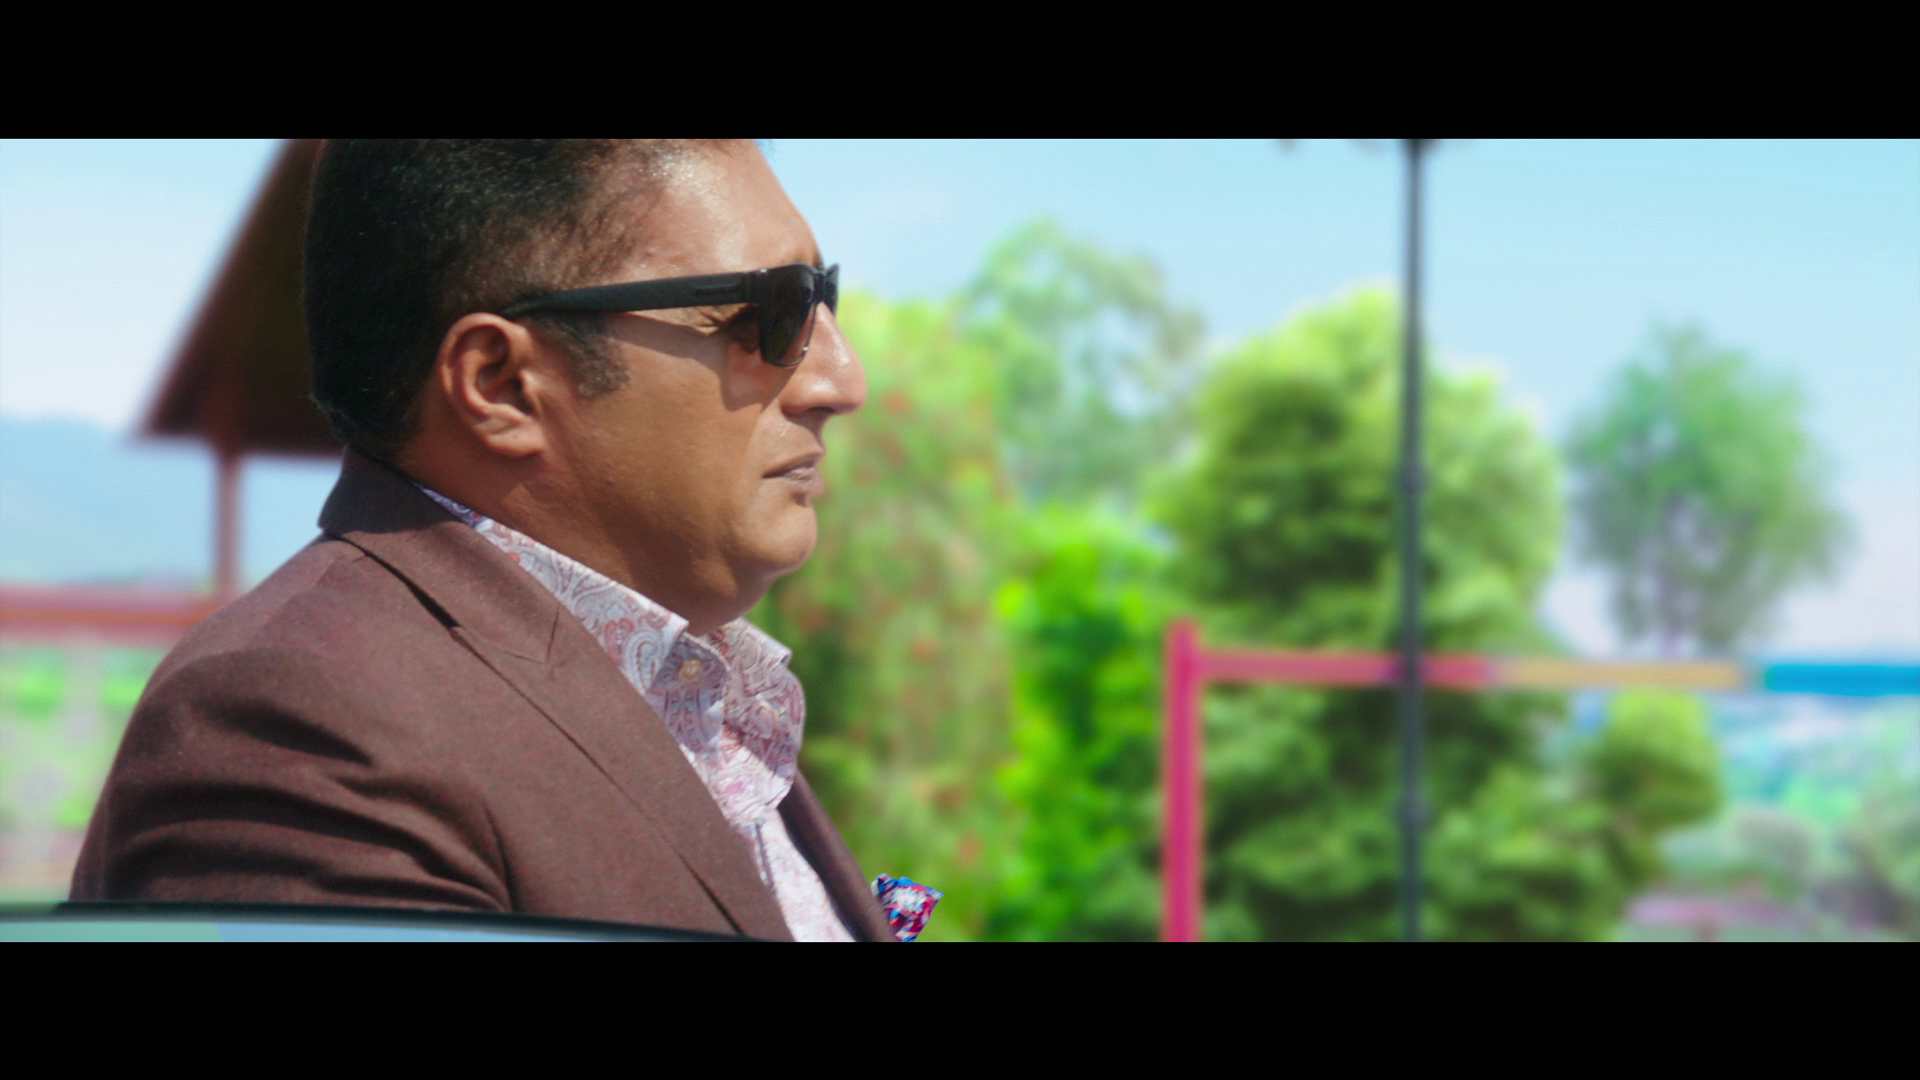 Golmaal Again (2017) 40.5 GiB 1080p Blu-ray Remux AVC TrueHD 5 1 - M2Tv